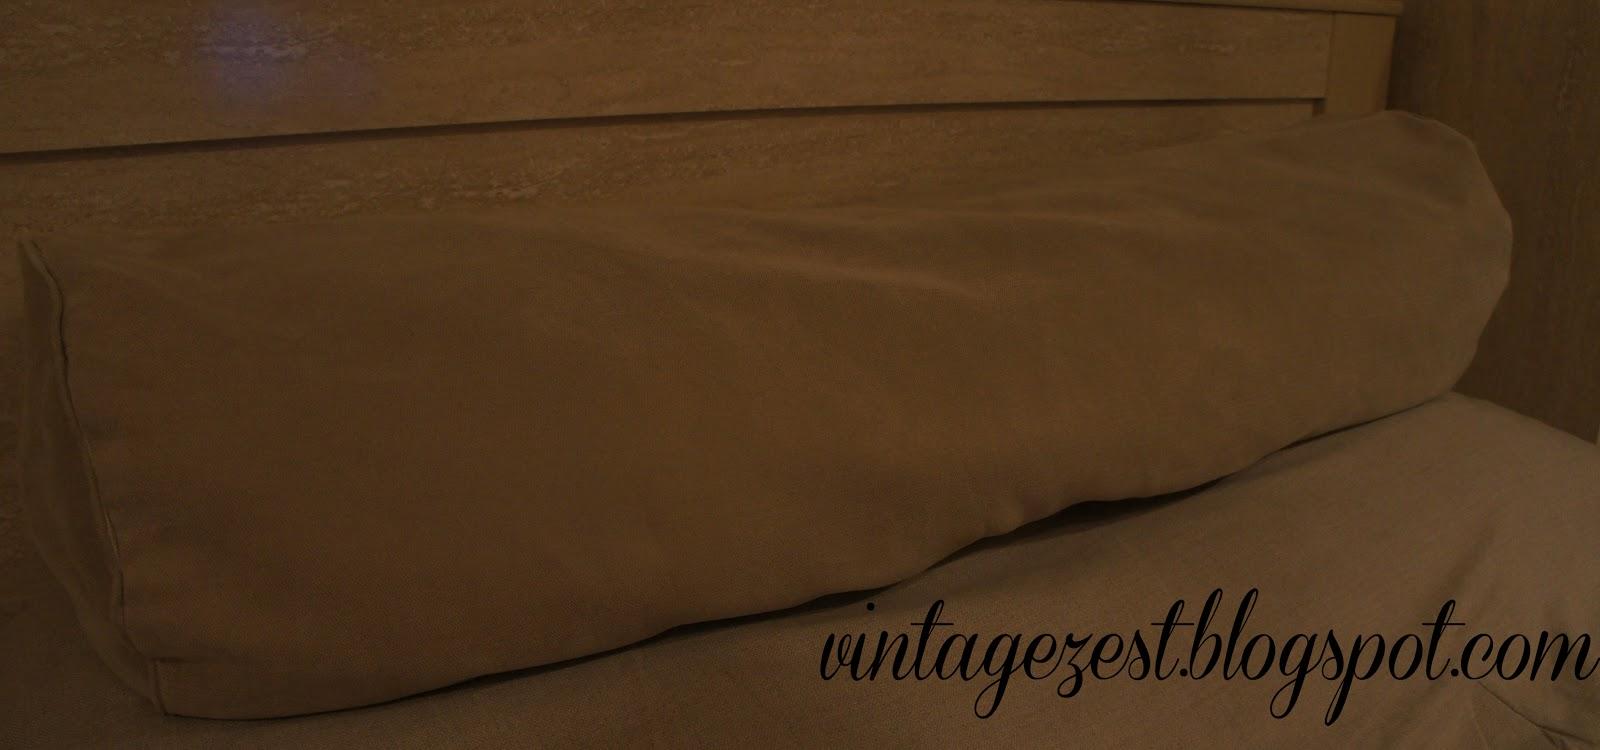 Sewing Rewind: Hodgepodge edition on Diane's Vintage Zest!